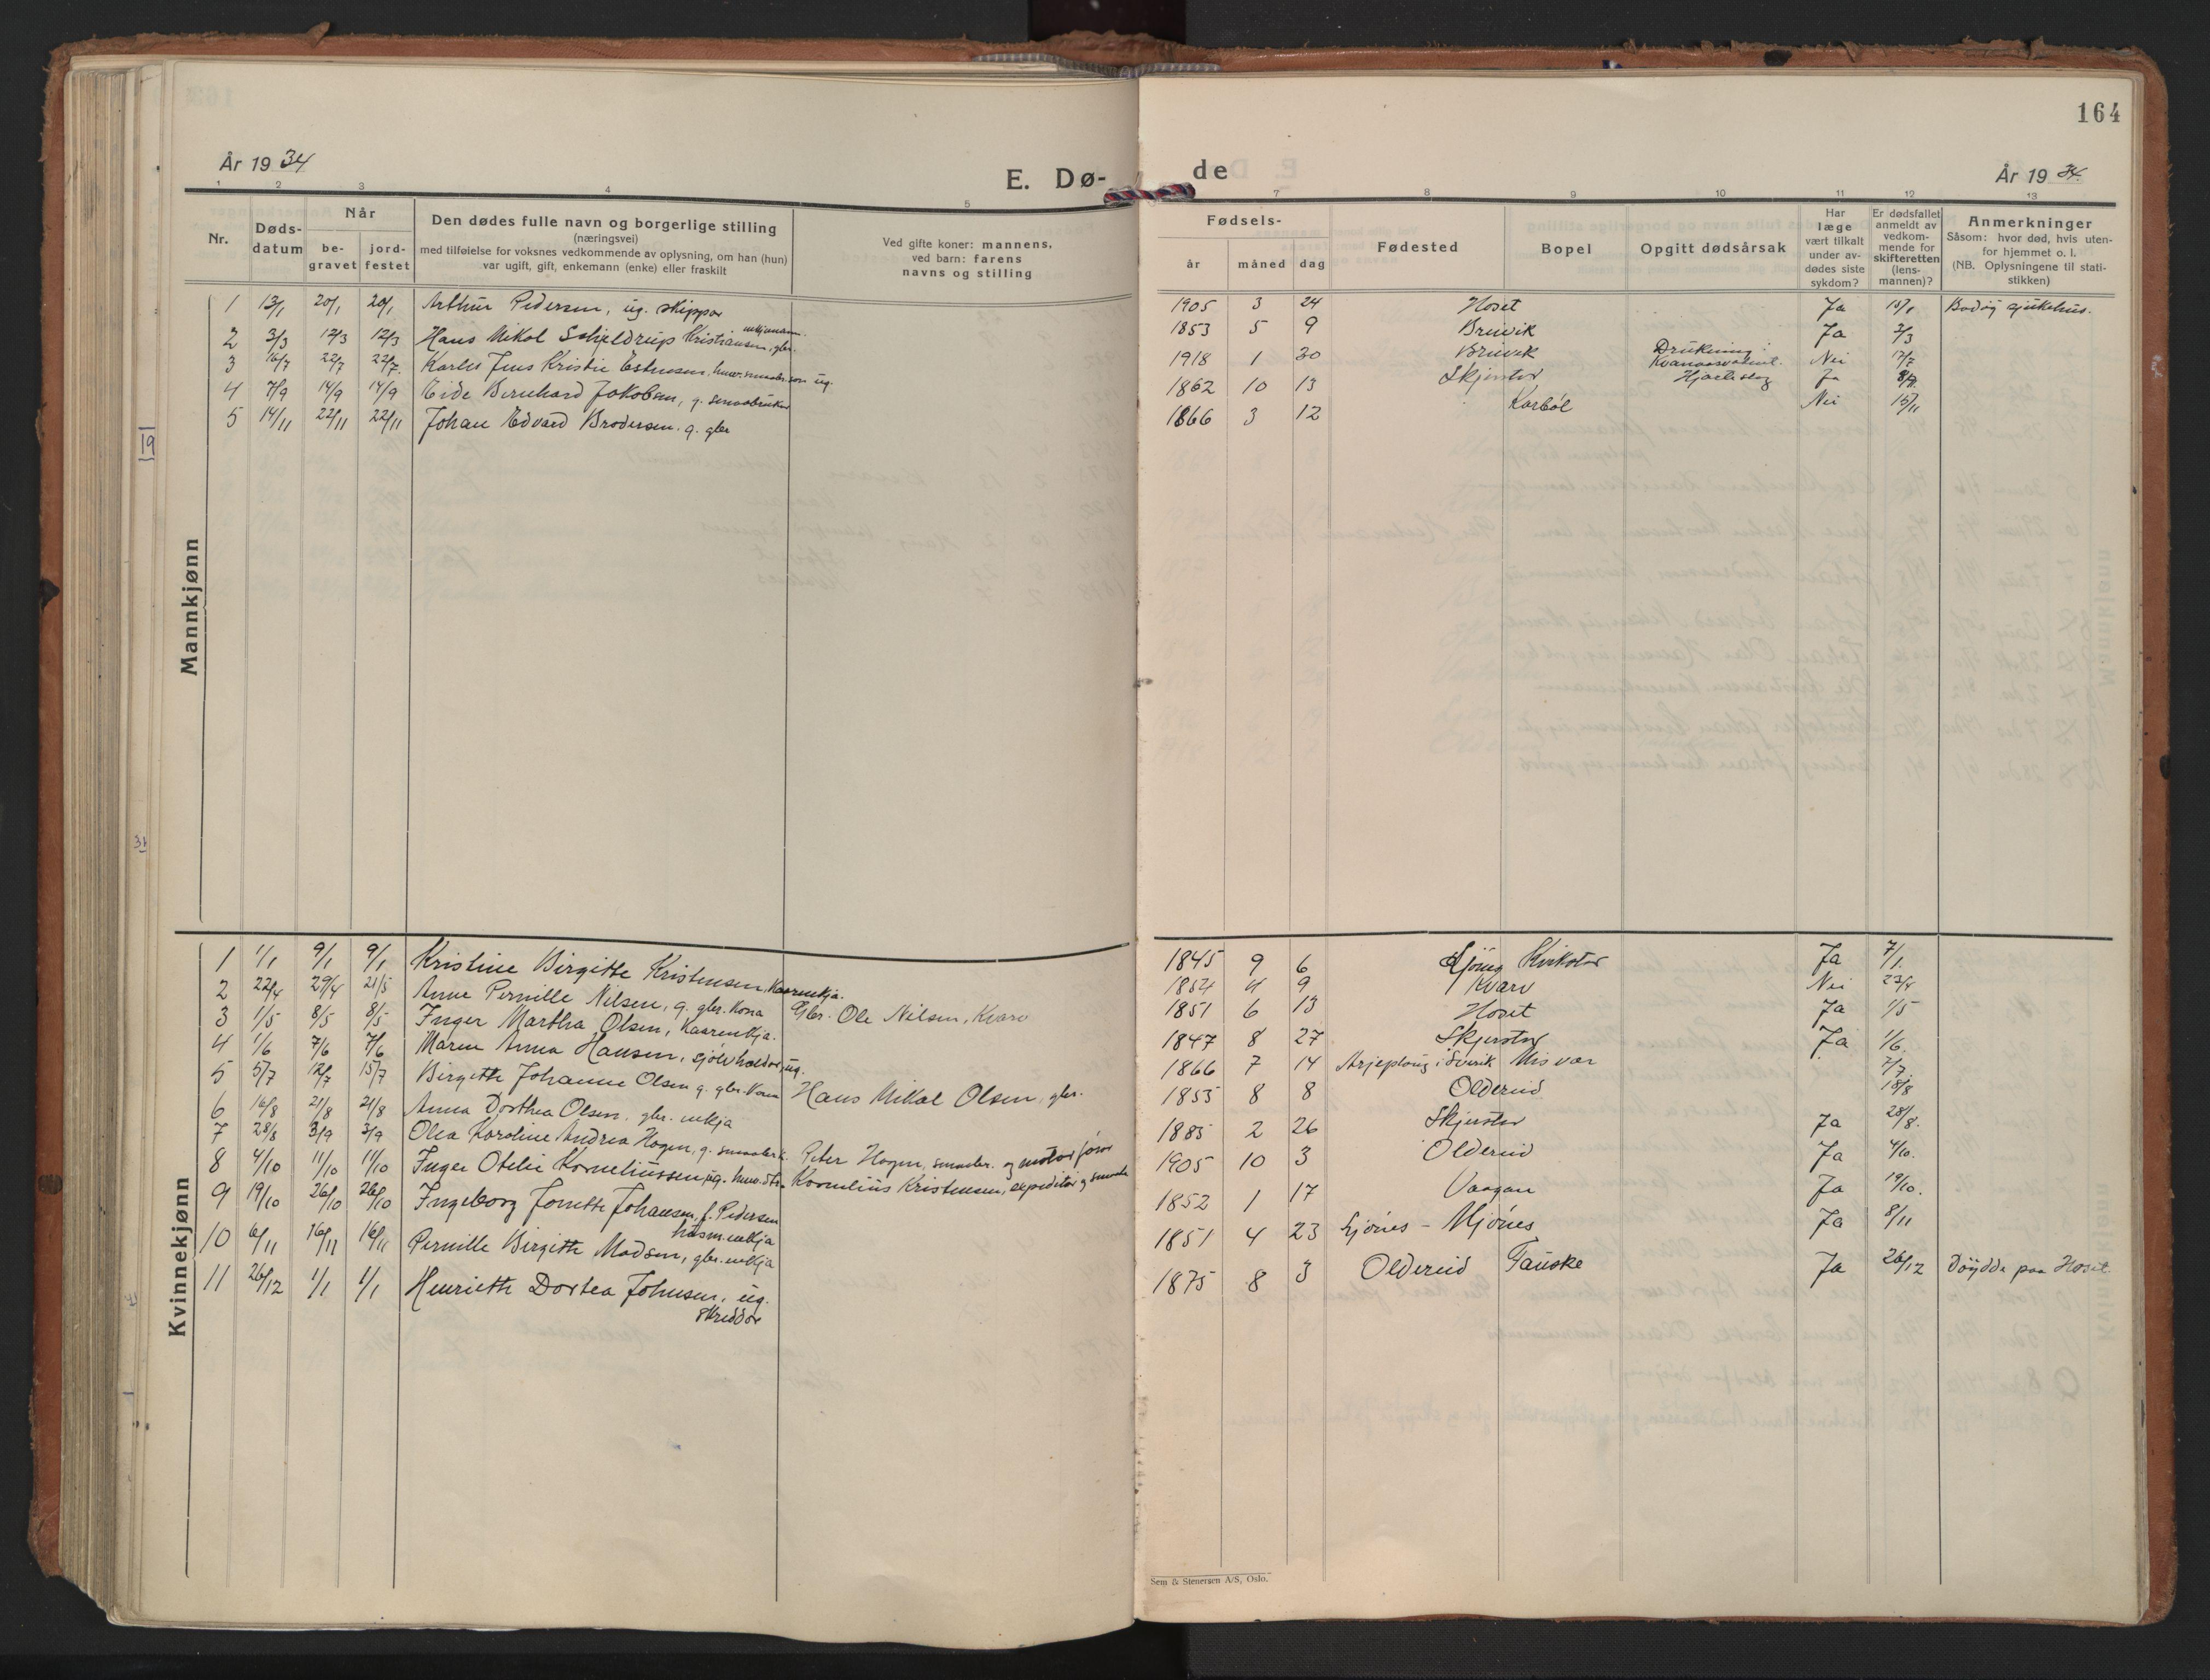 SAT, Ministerialprotokoller, klokkerbøker og fødselsregistre - Nordland, 852/L0749: Ministerialbok nr. 852A19, 1933-1951, s. 164